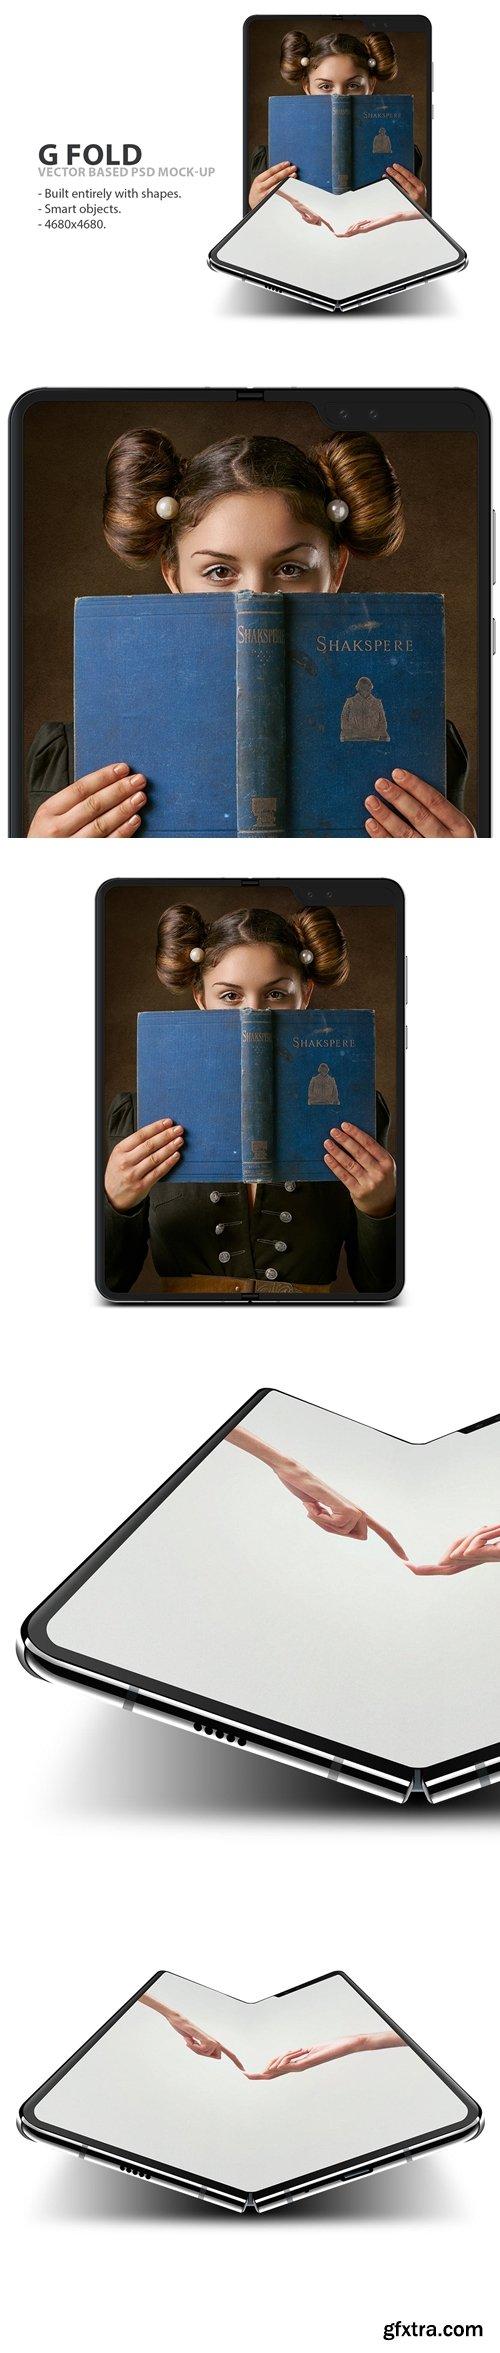 G Fold Smartphone PSD Mock-Ups